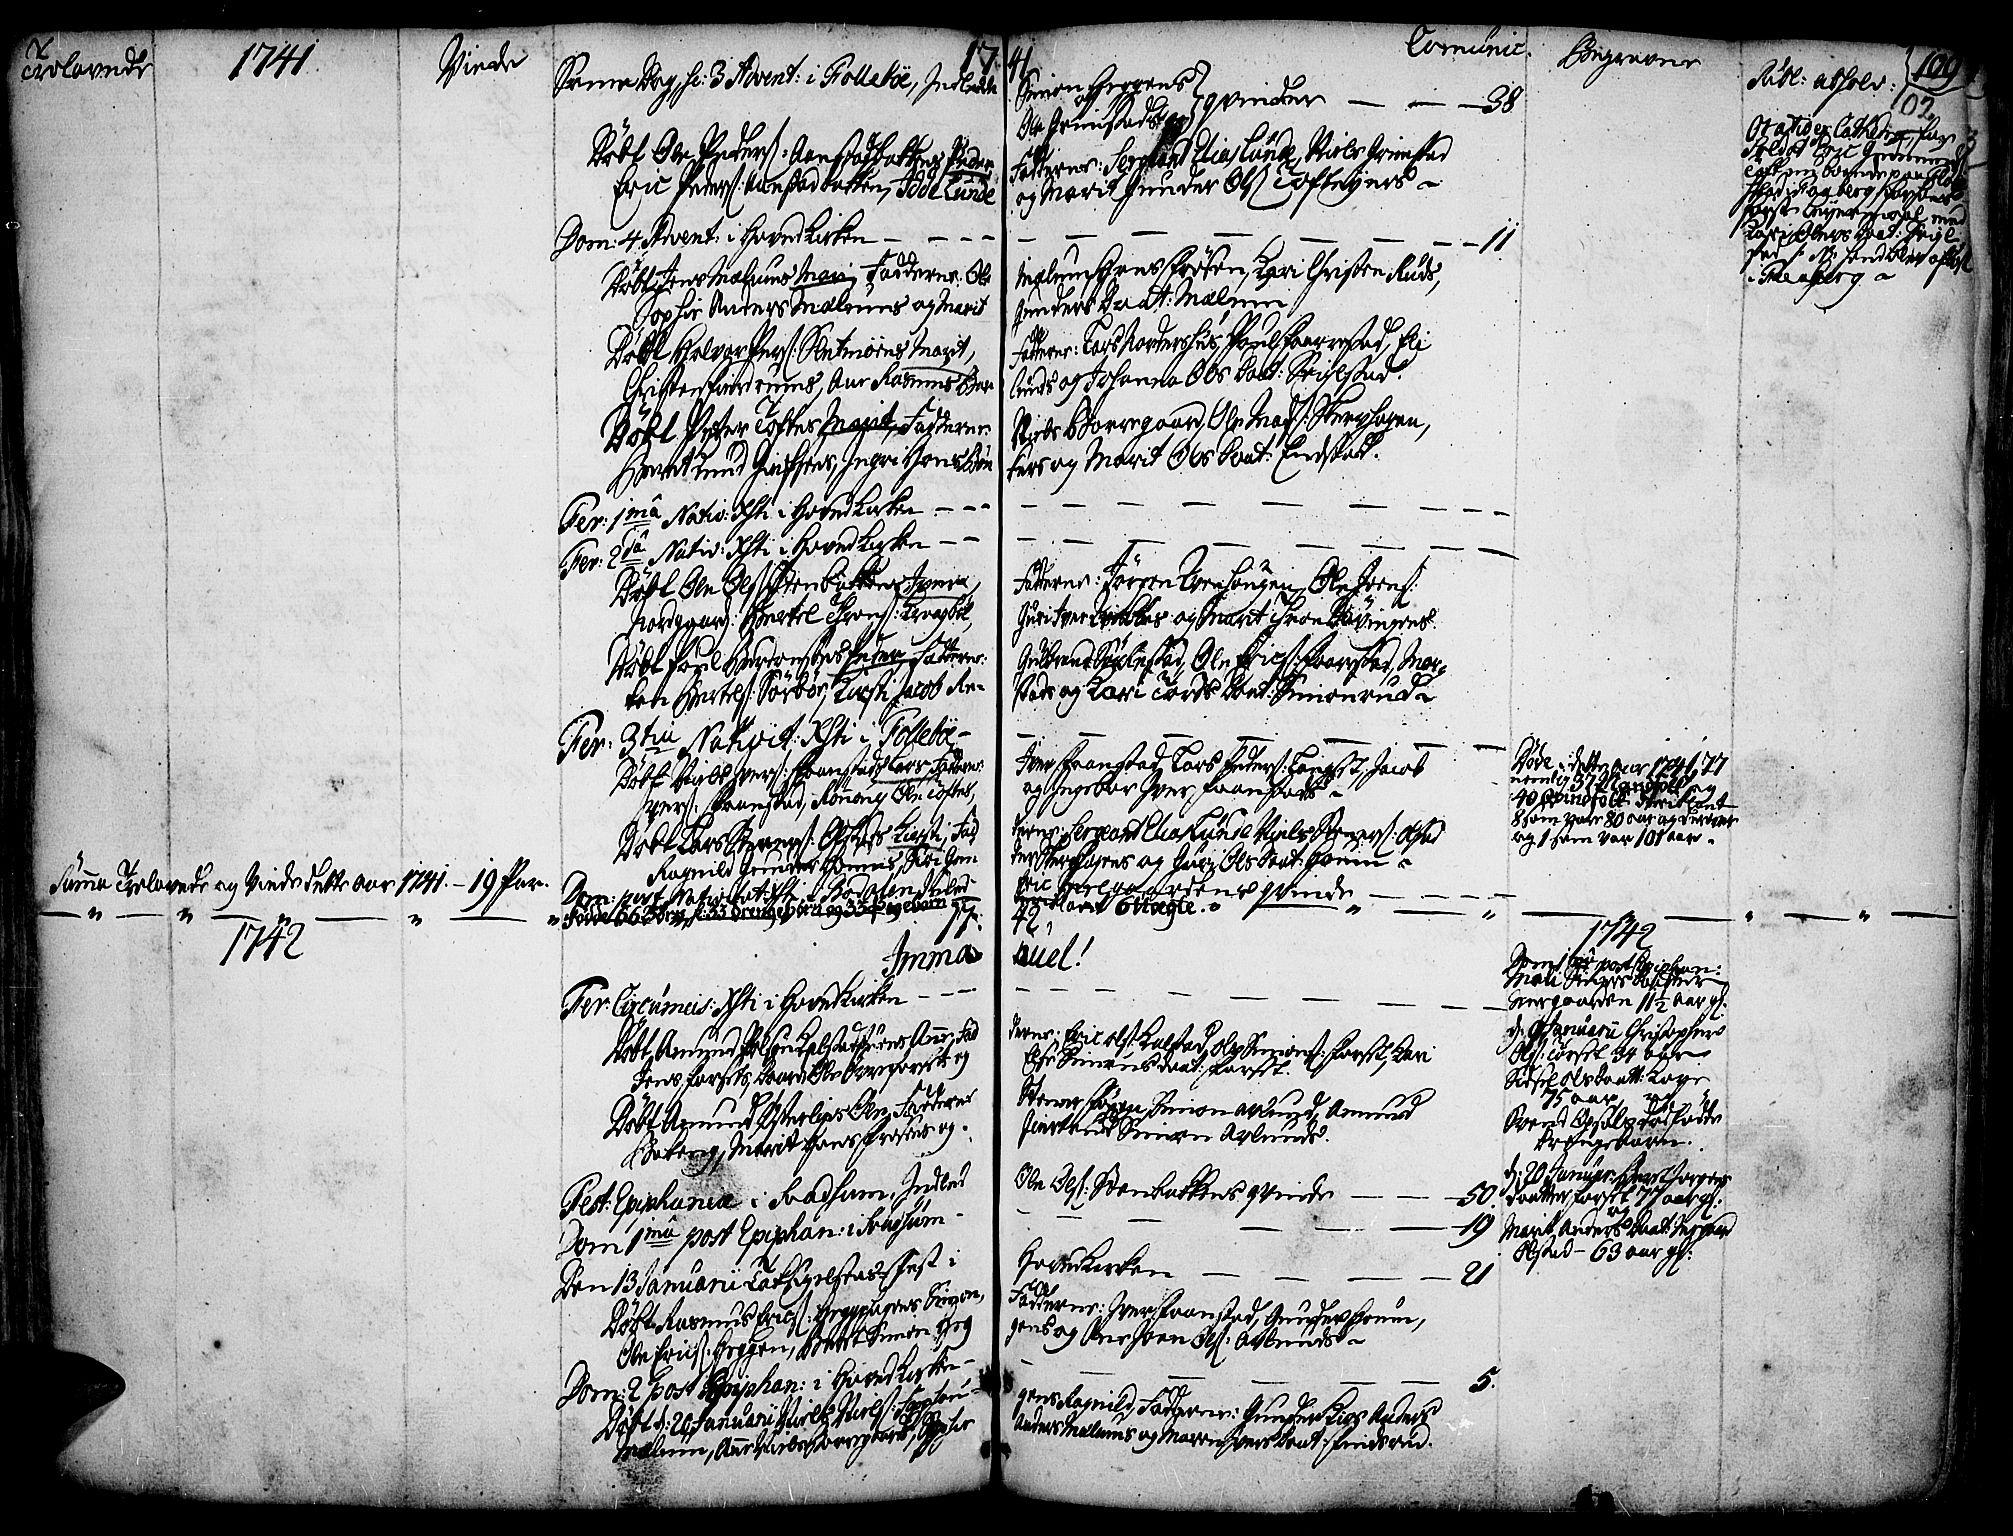 SAH, Gausdal prestekontor, Ministerialbok nr. 2, 1729-1757, s. 102